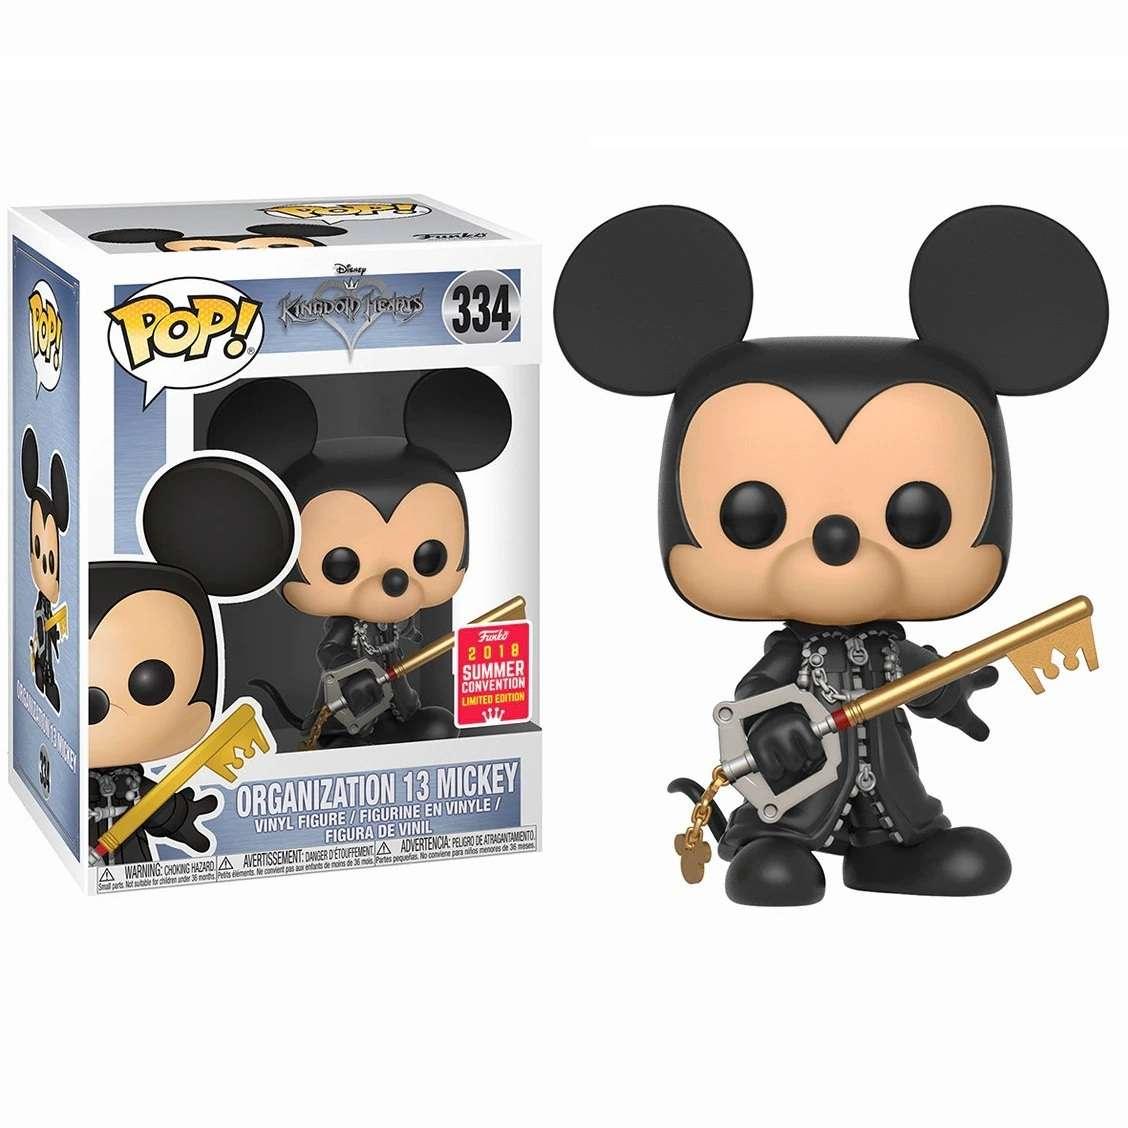 POP!: Kingdom Hearts - Organization 13 Mickey (SDCC 2018 Exclusive) Photo